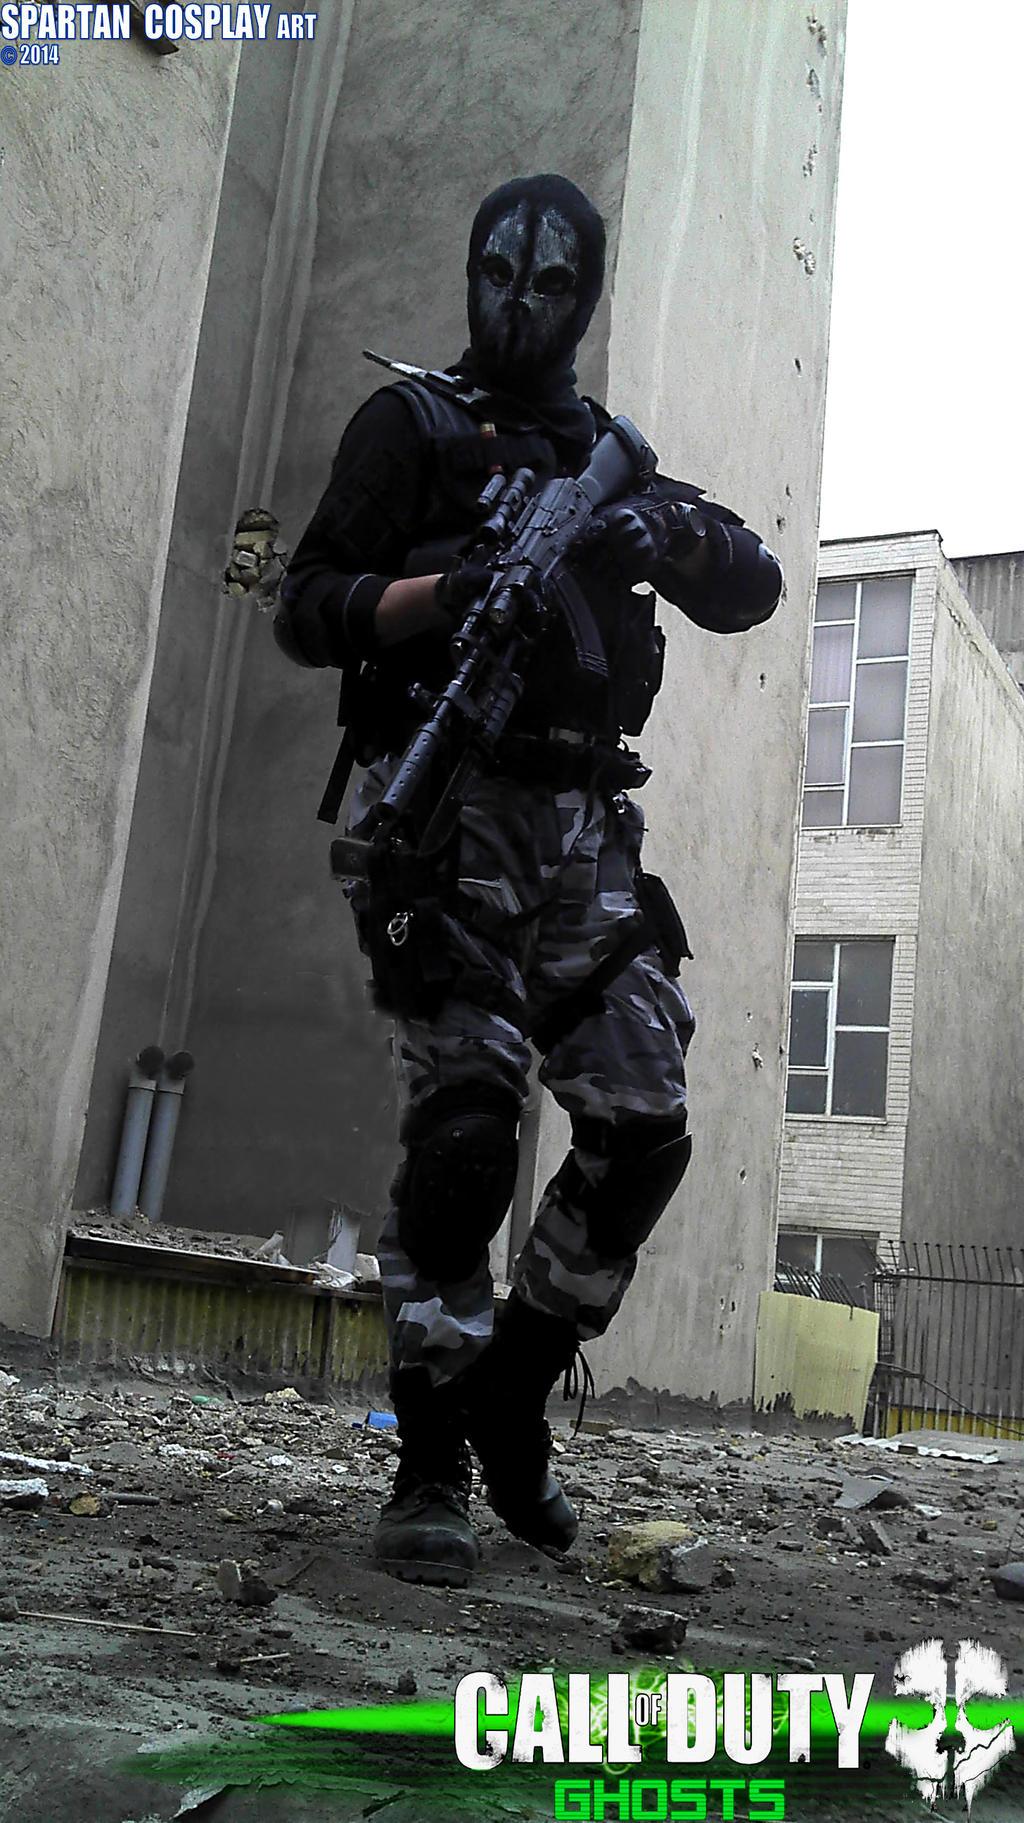 call of dutyghostscosplay artlogan walker by